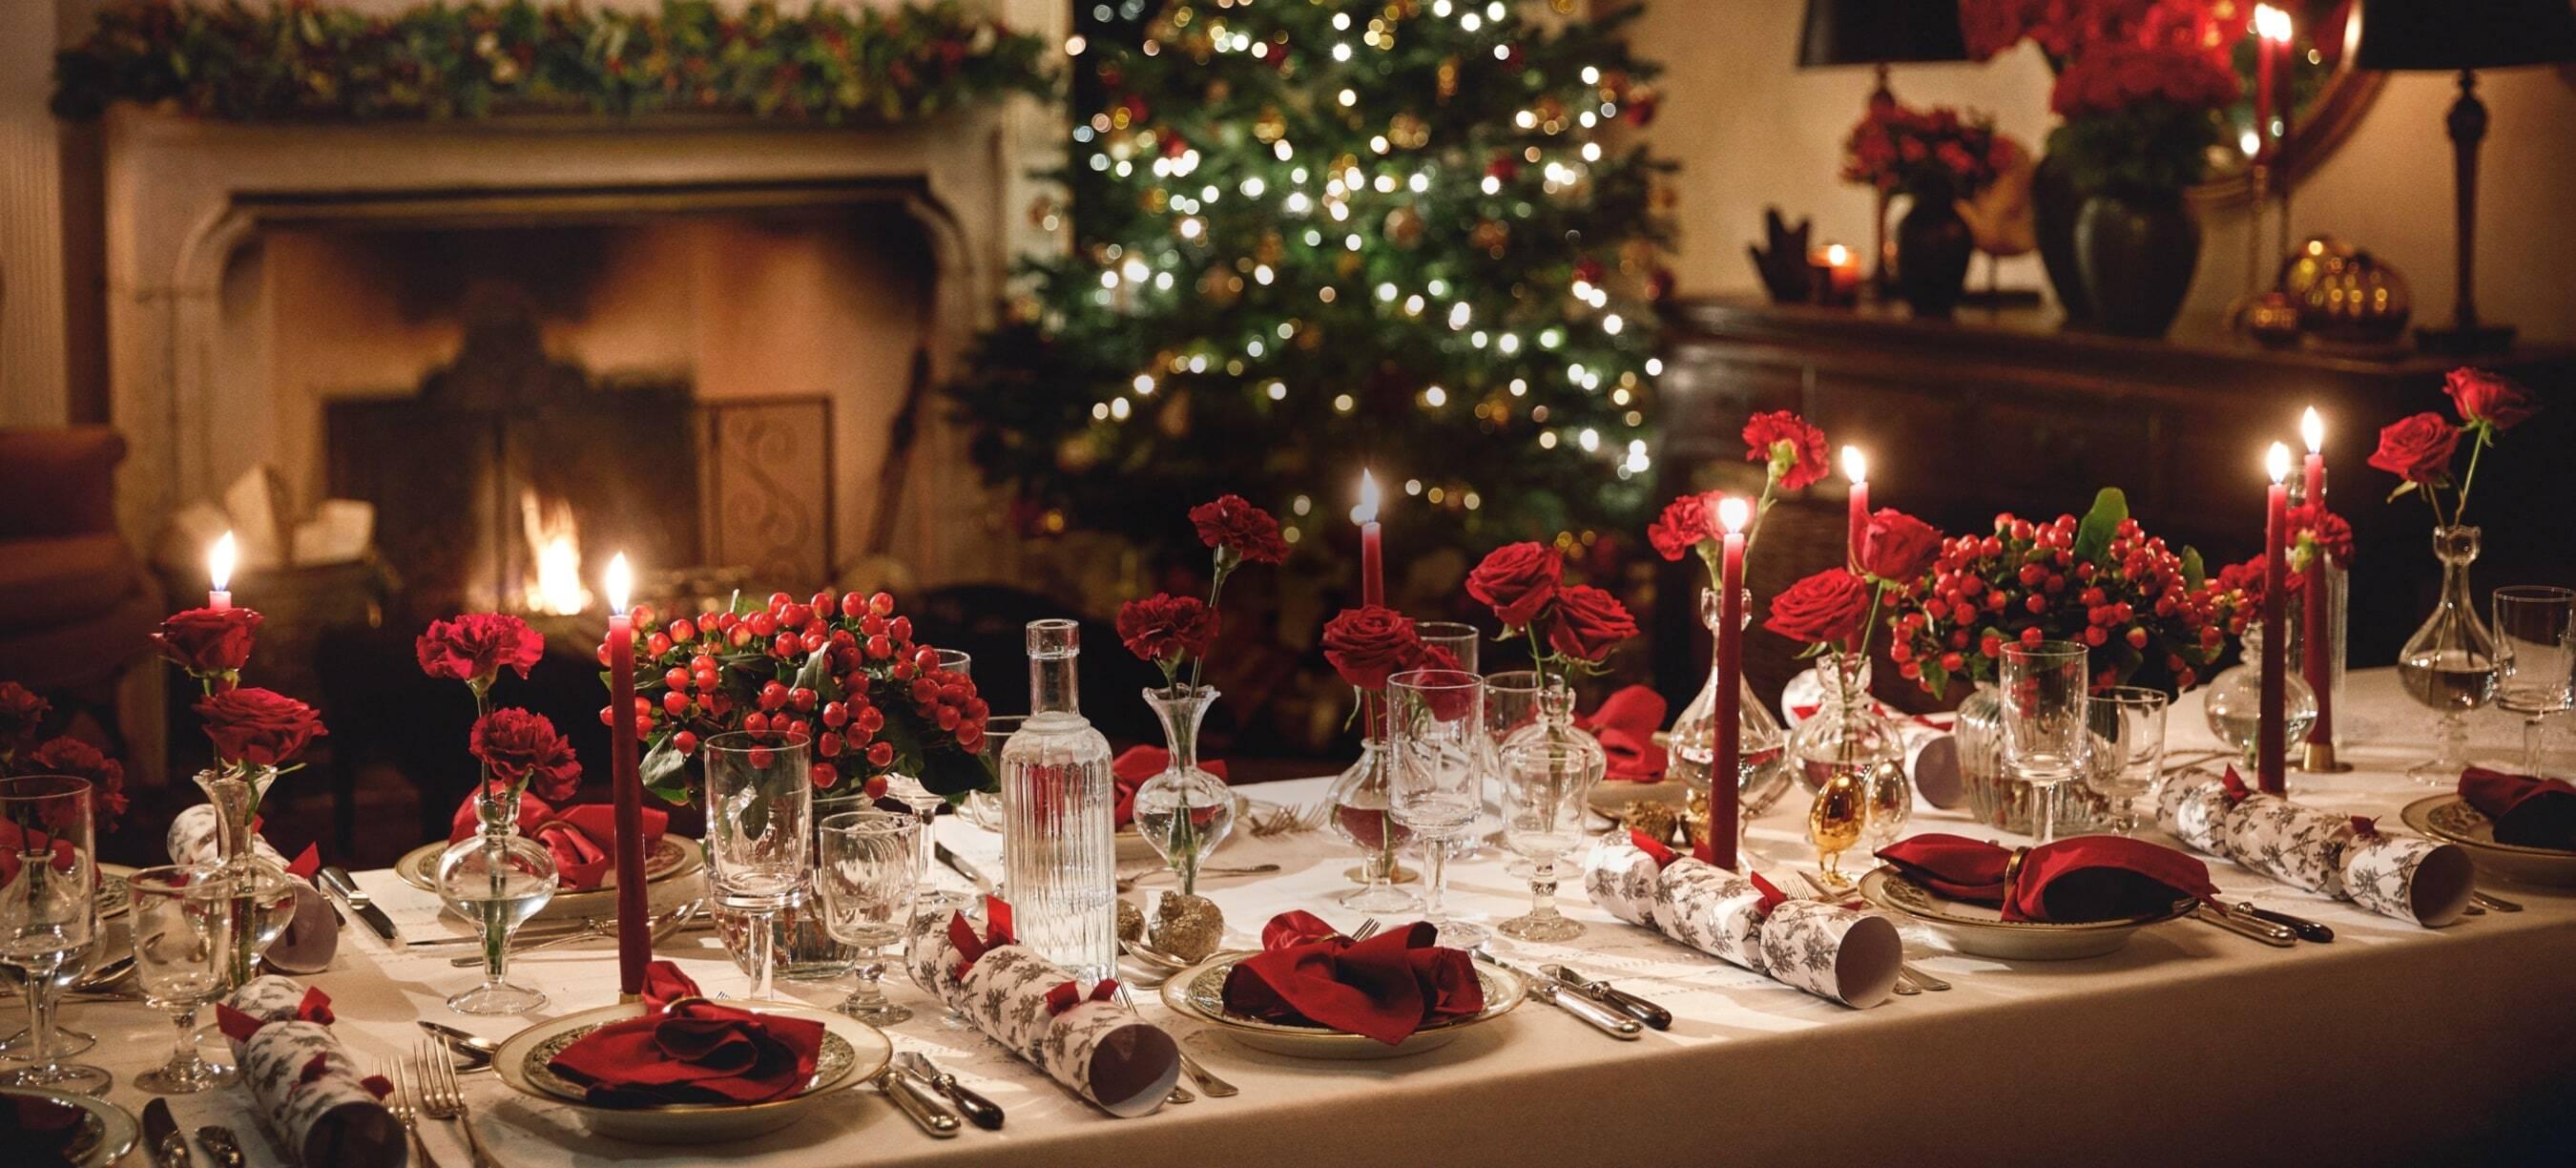 Sets de table de Noël